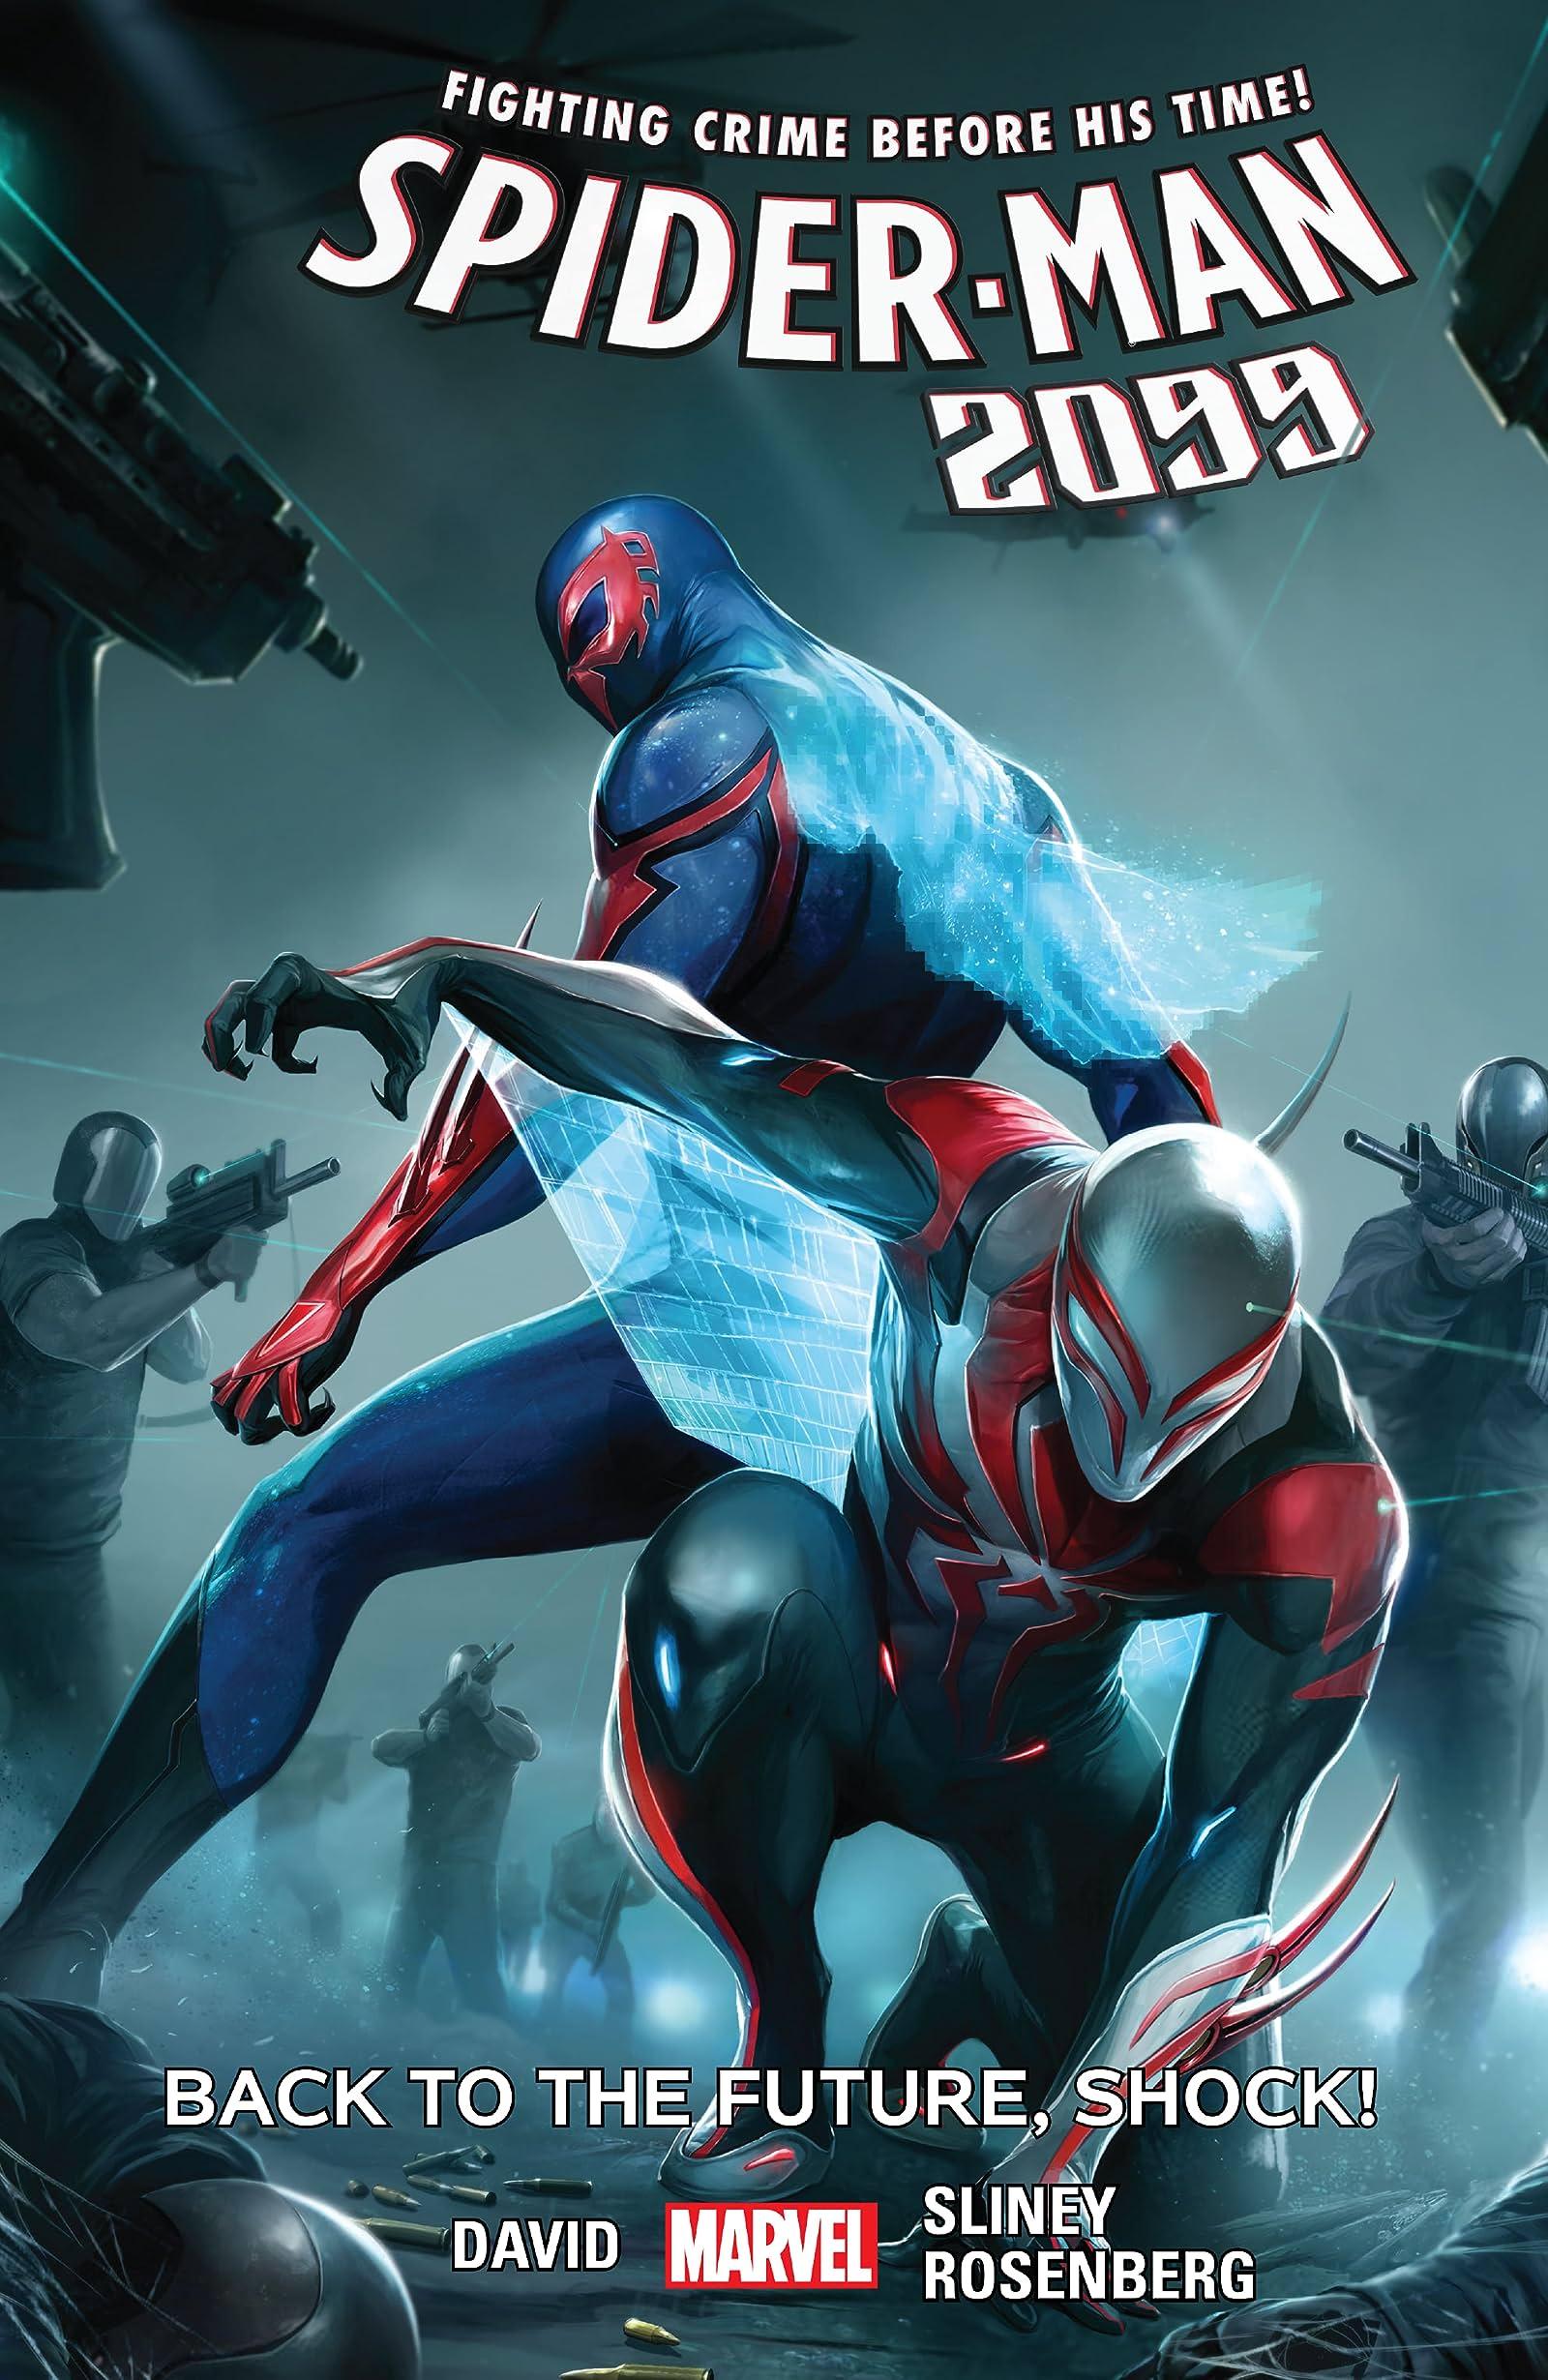 Spiderman 2099